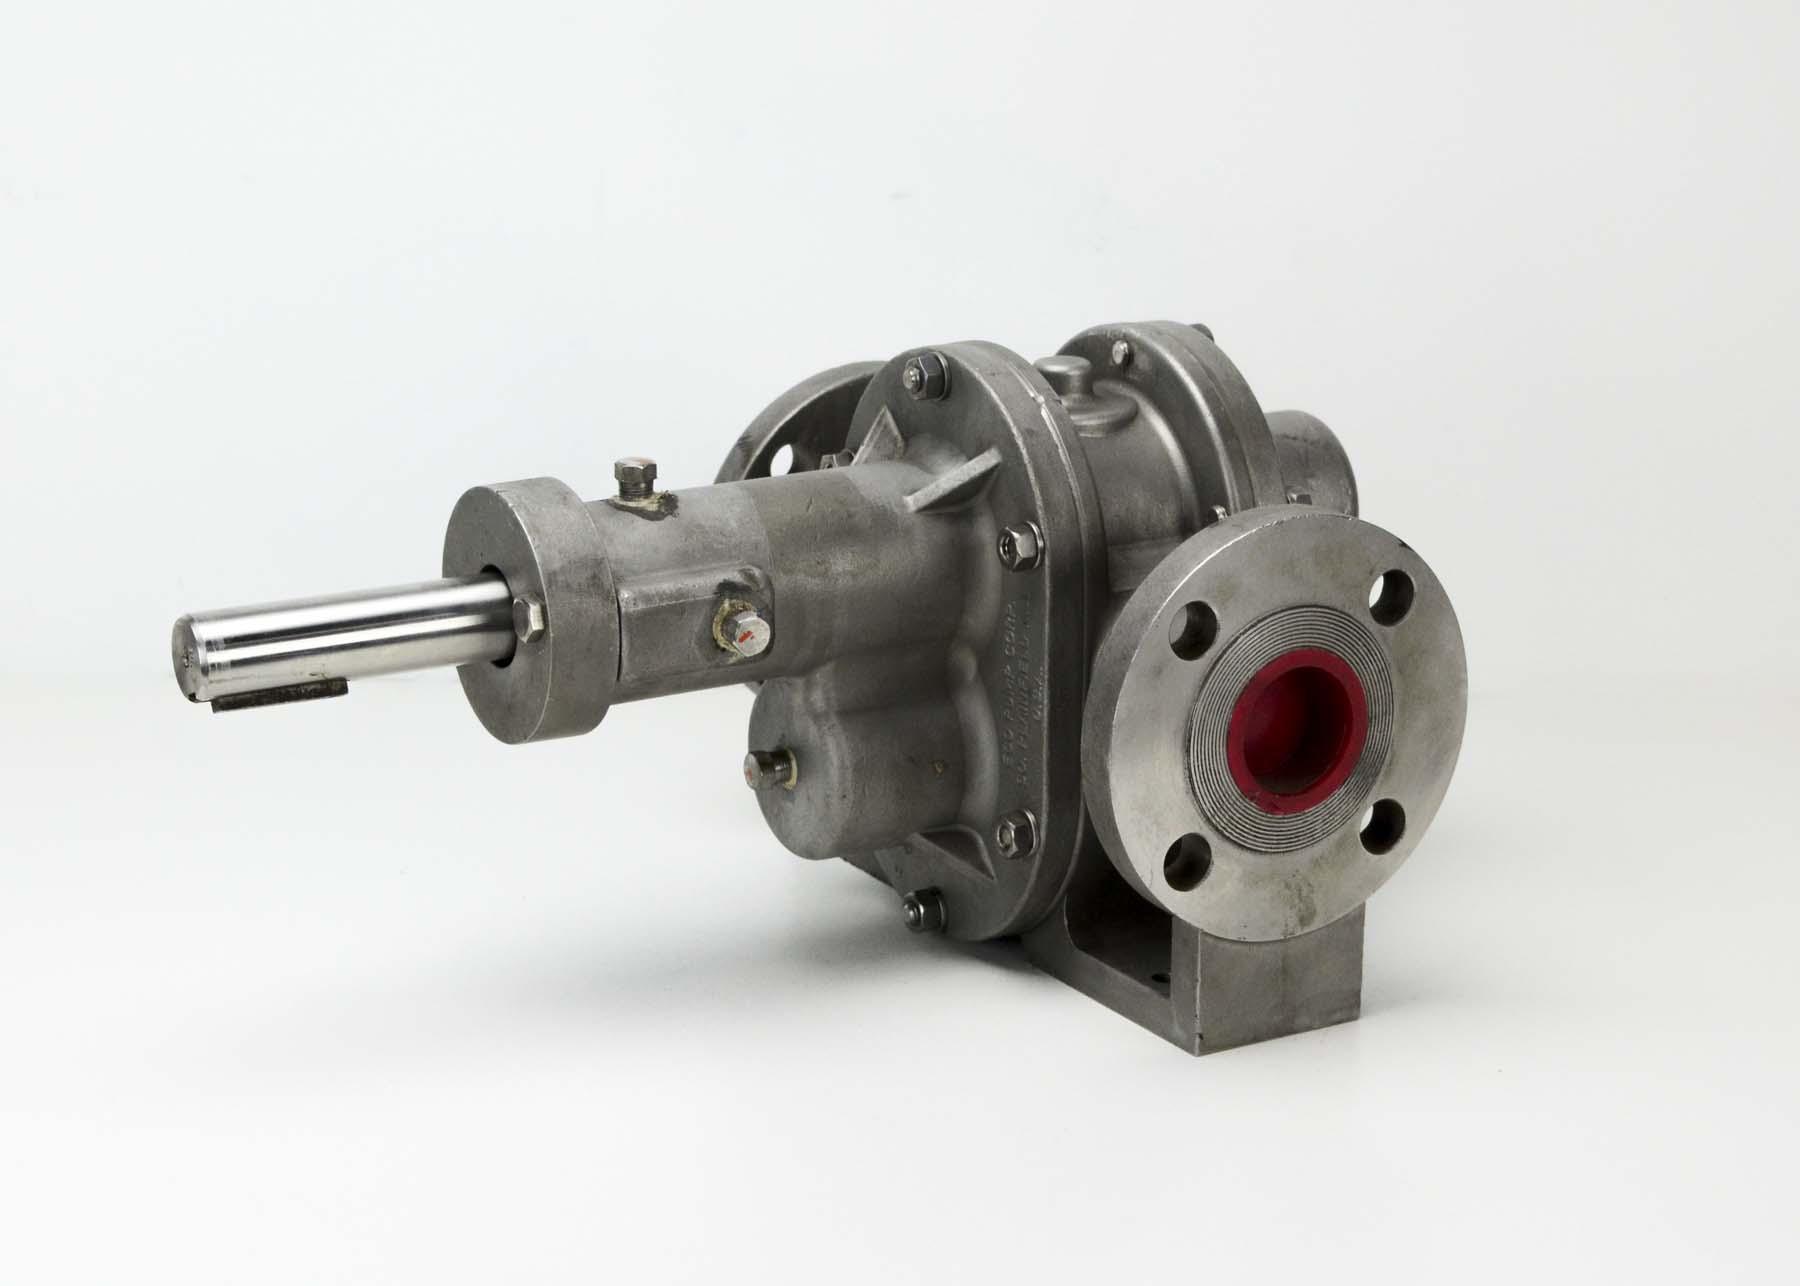 One Guard Warranty >> Gear Pumps - SRSINTLDIRECT - Gear pumps are excellent slurry pumps when pumping